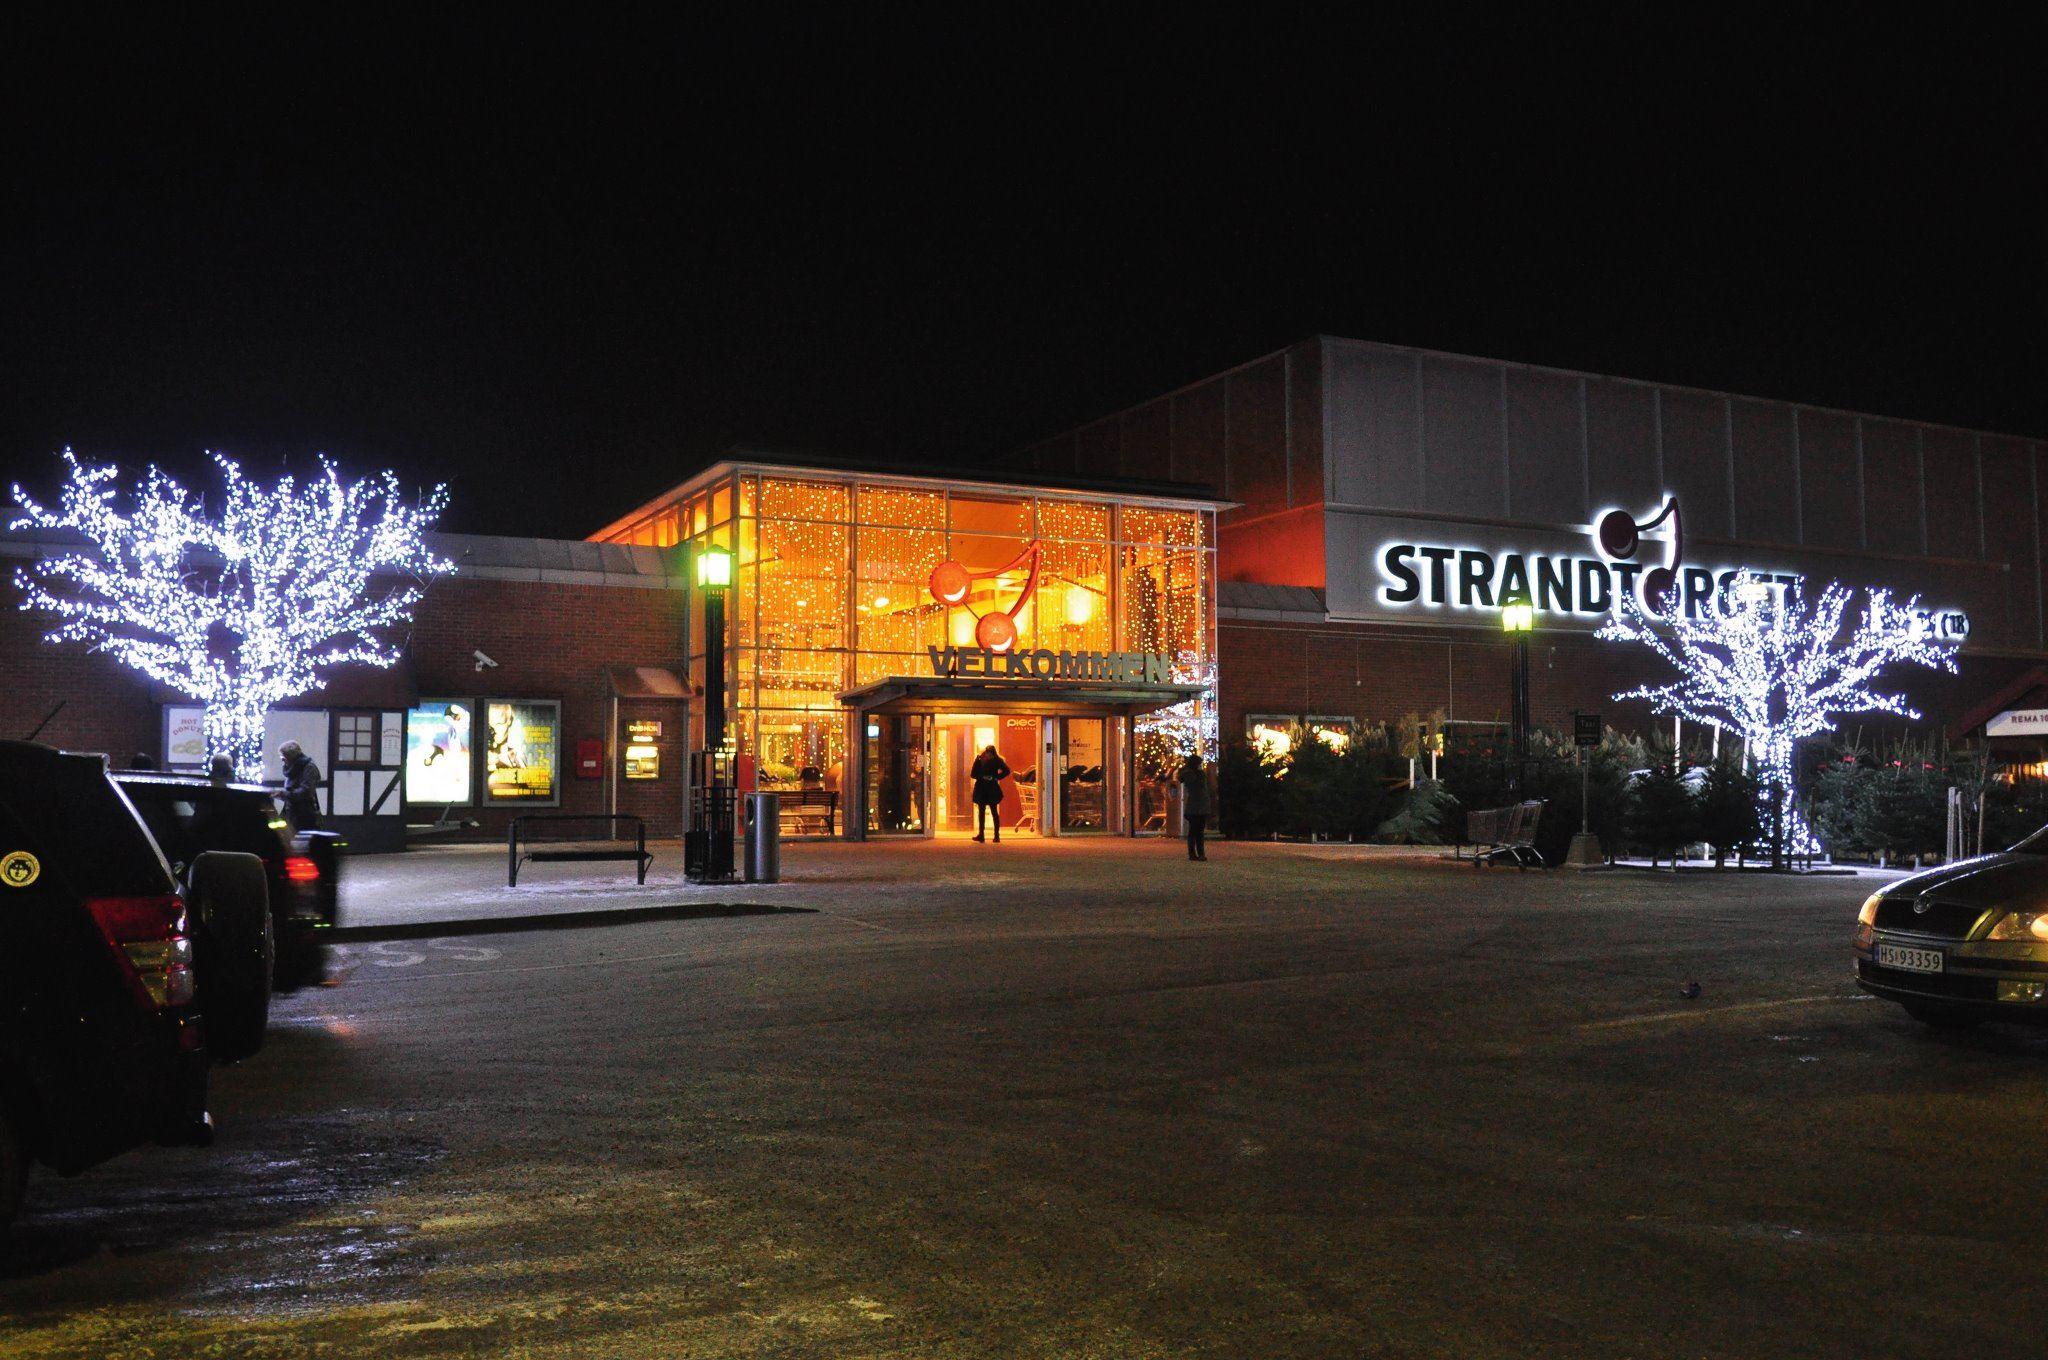 Strandtorget shopping center